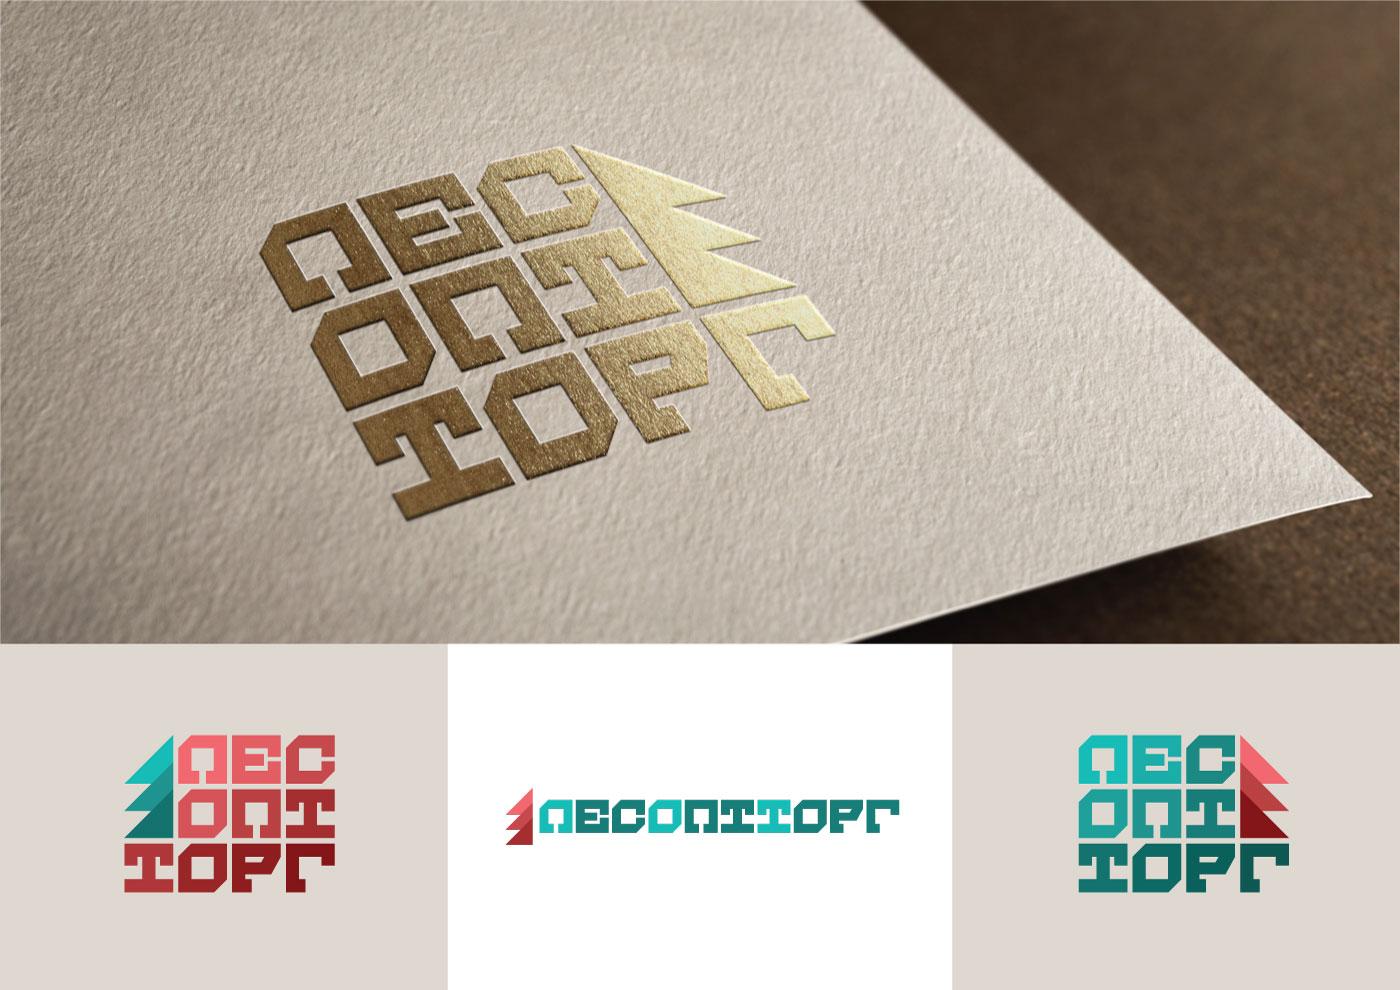 Razvoj LesOptTorg logo